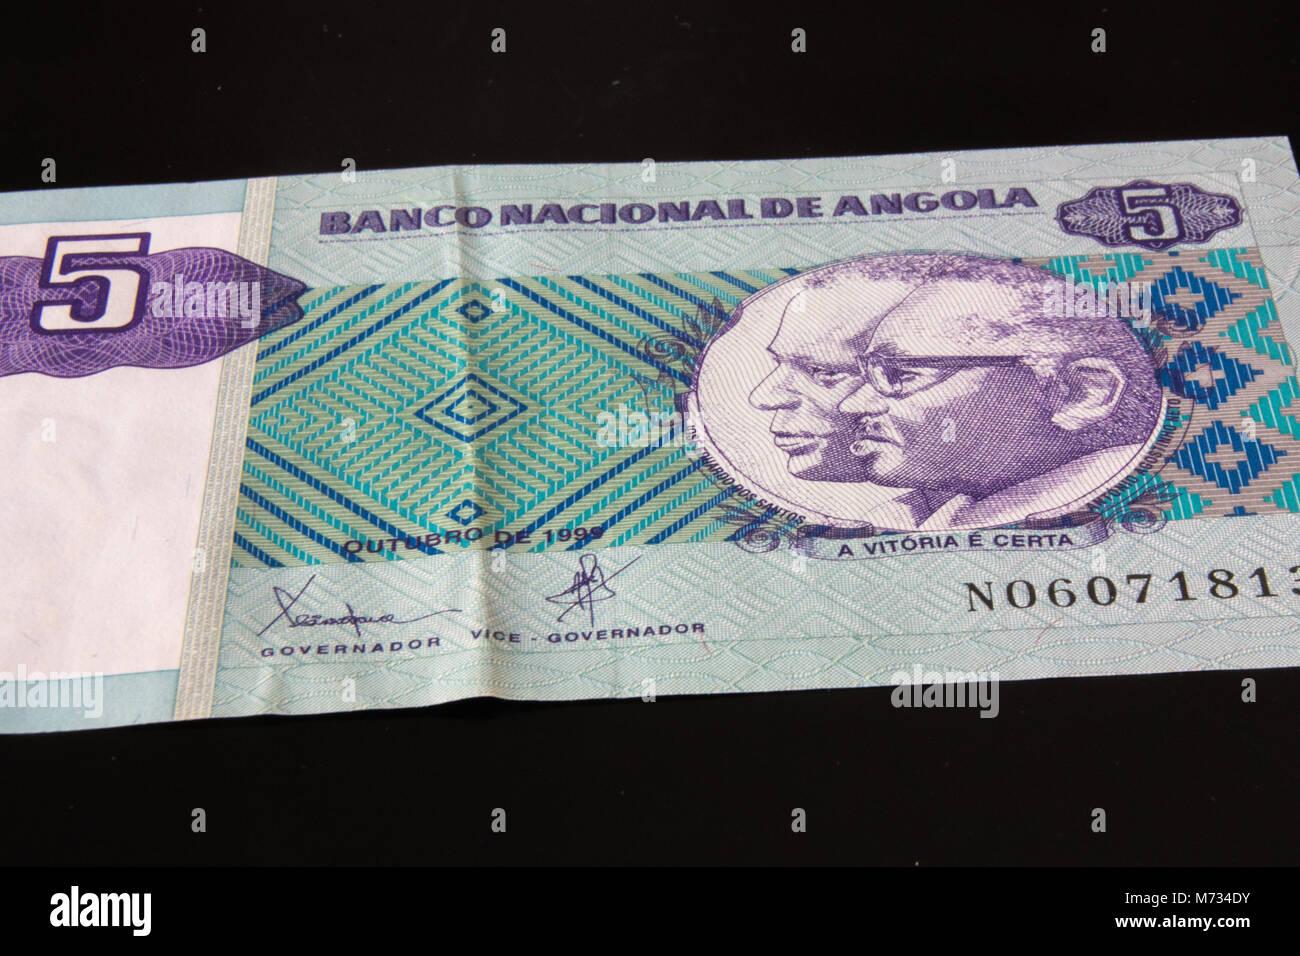 Banknote from Angola, five Kwanza. - Stock Image